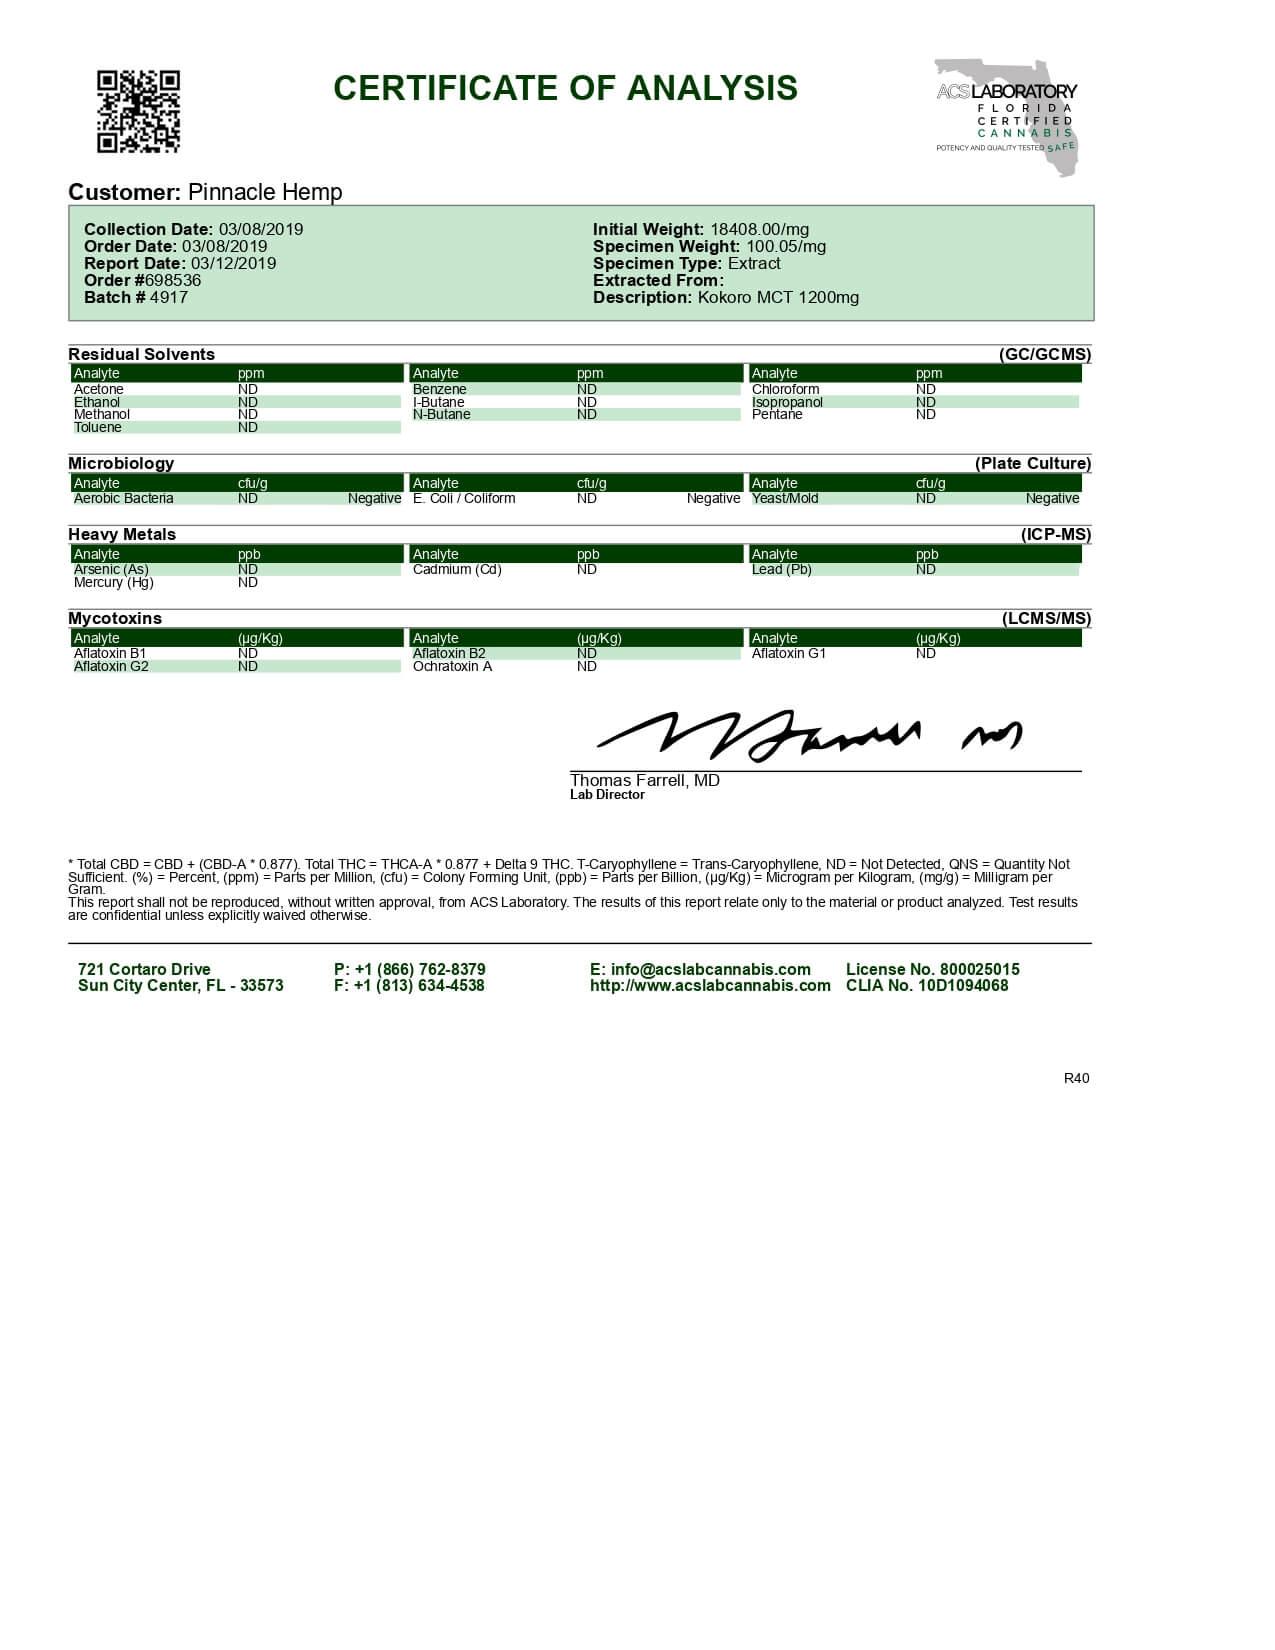 Kokoro CBD Tincture Broad Spectrum MCT Oil 1200mg Lab Report